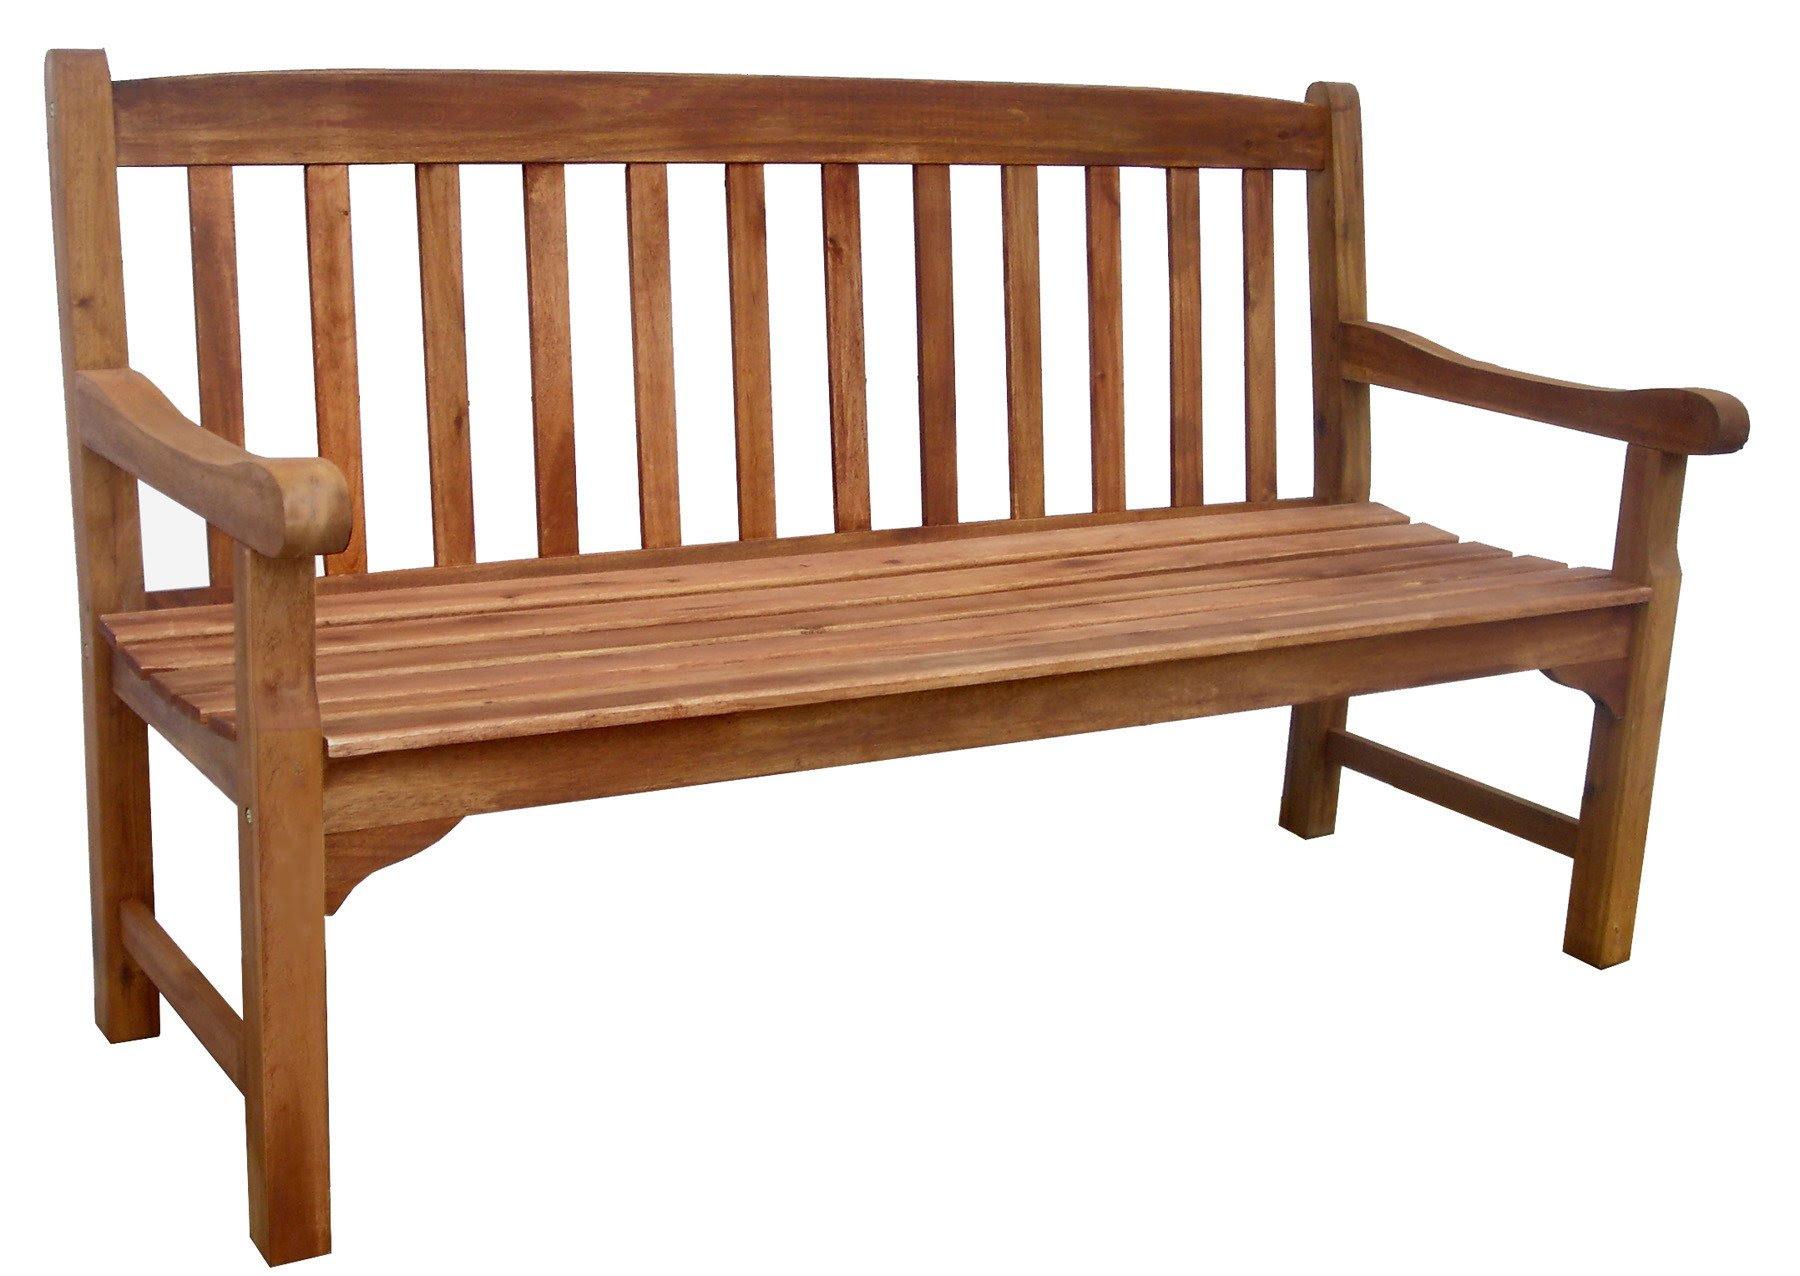 Rangoon 3 Seater Bench - Simply Wood